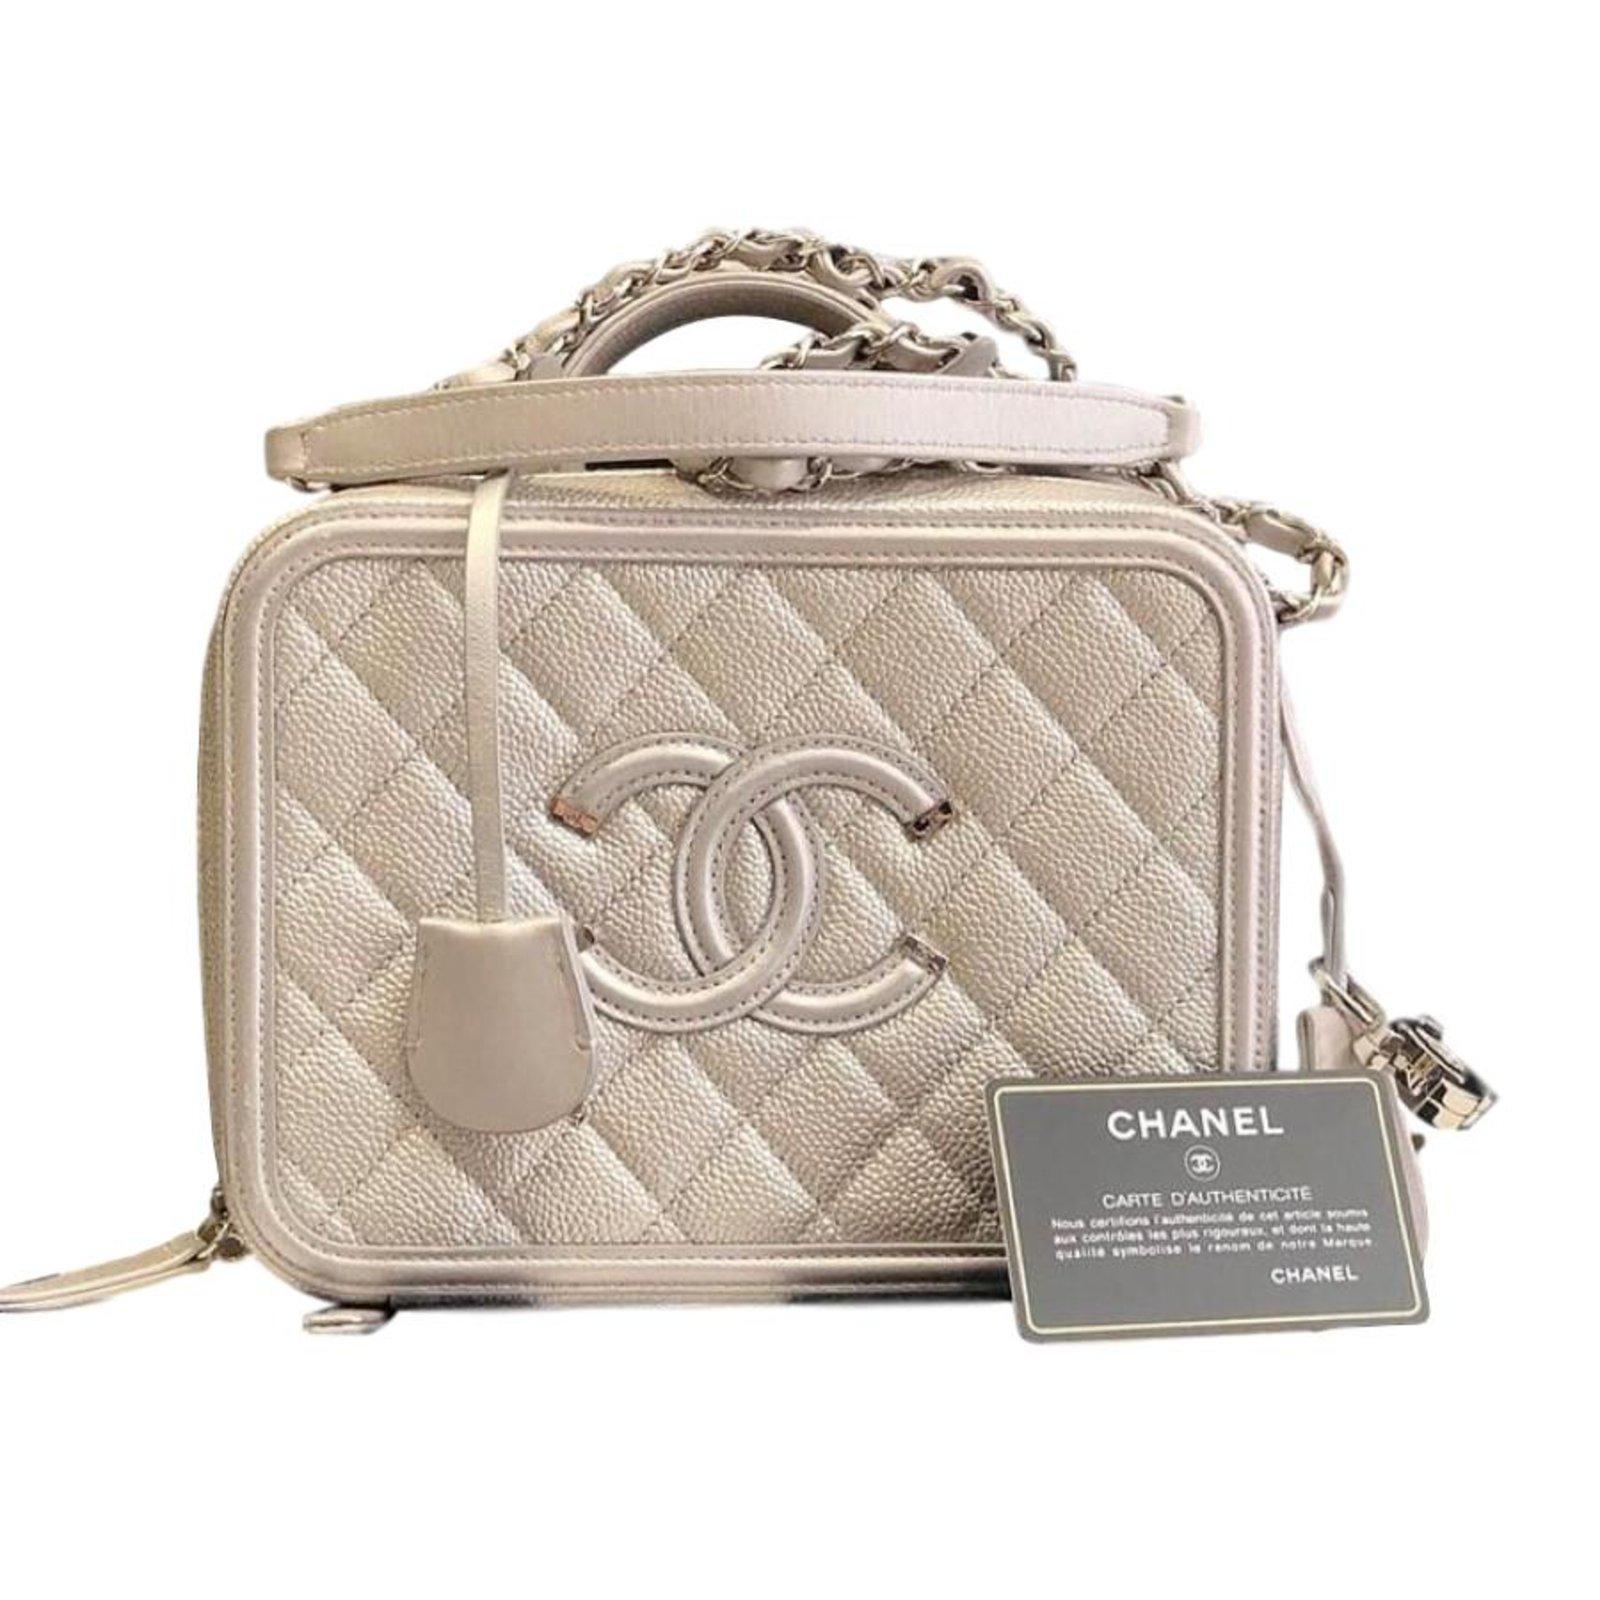 e86ac17f8eaf Chanel Vanity case Handbags Leather Silvery ref.67345 - Joli Closet